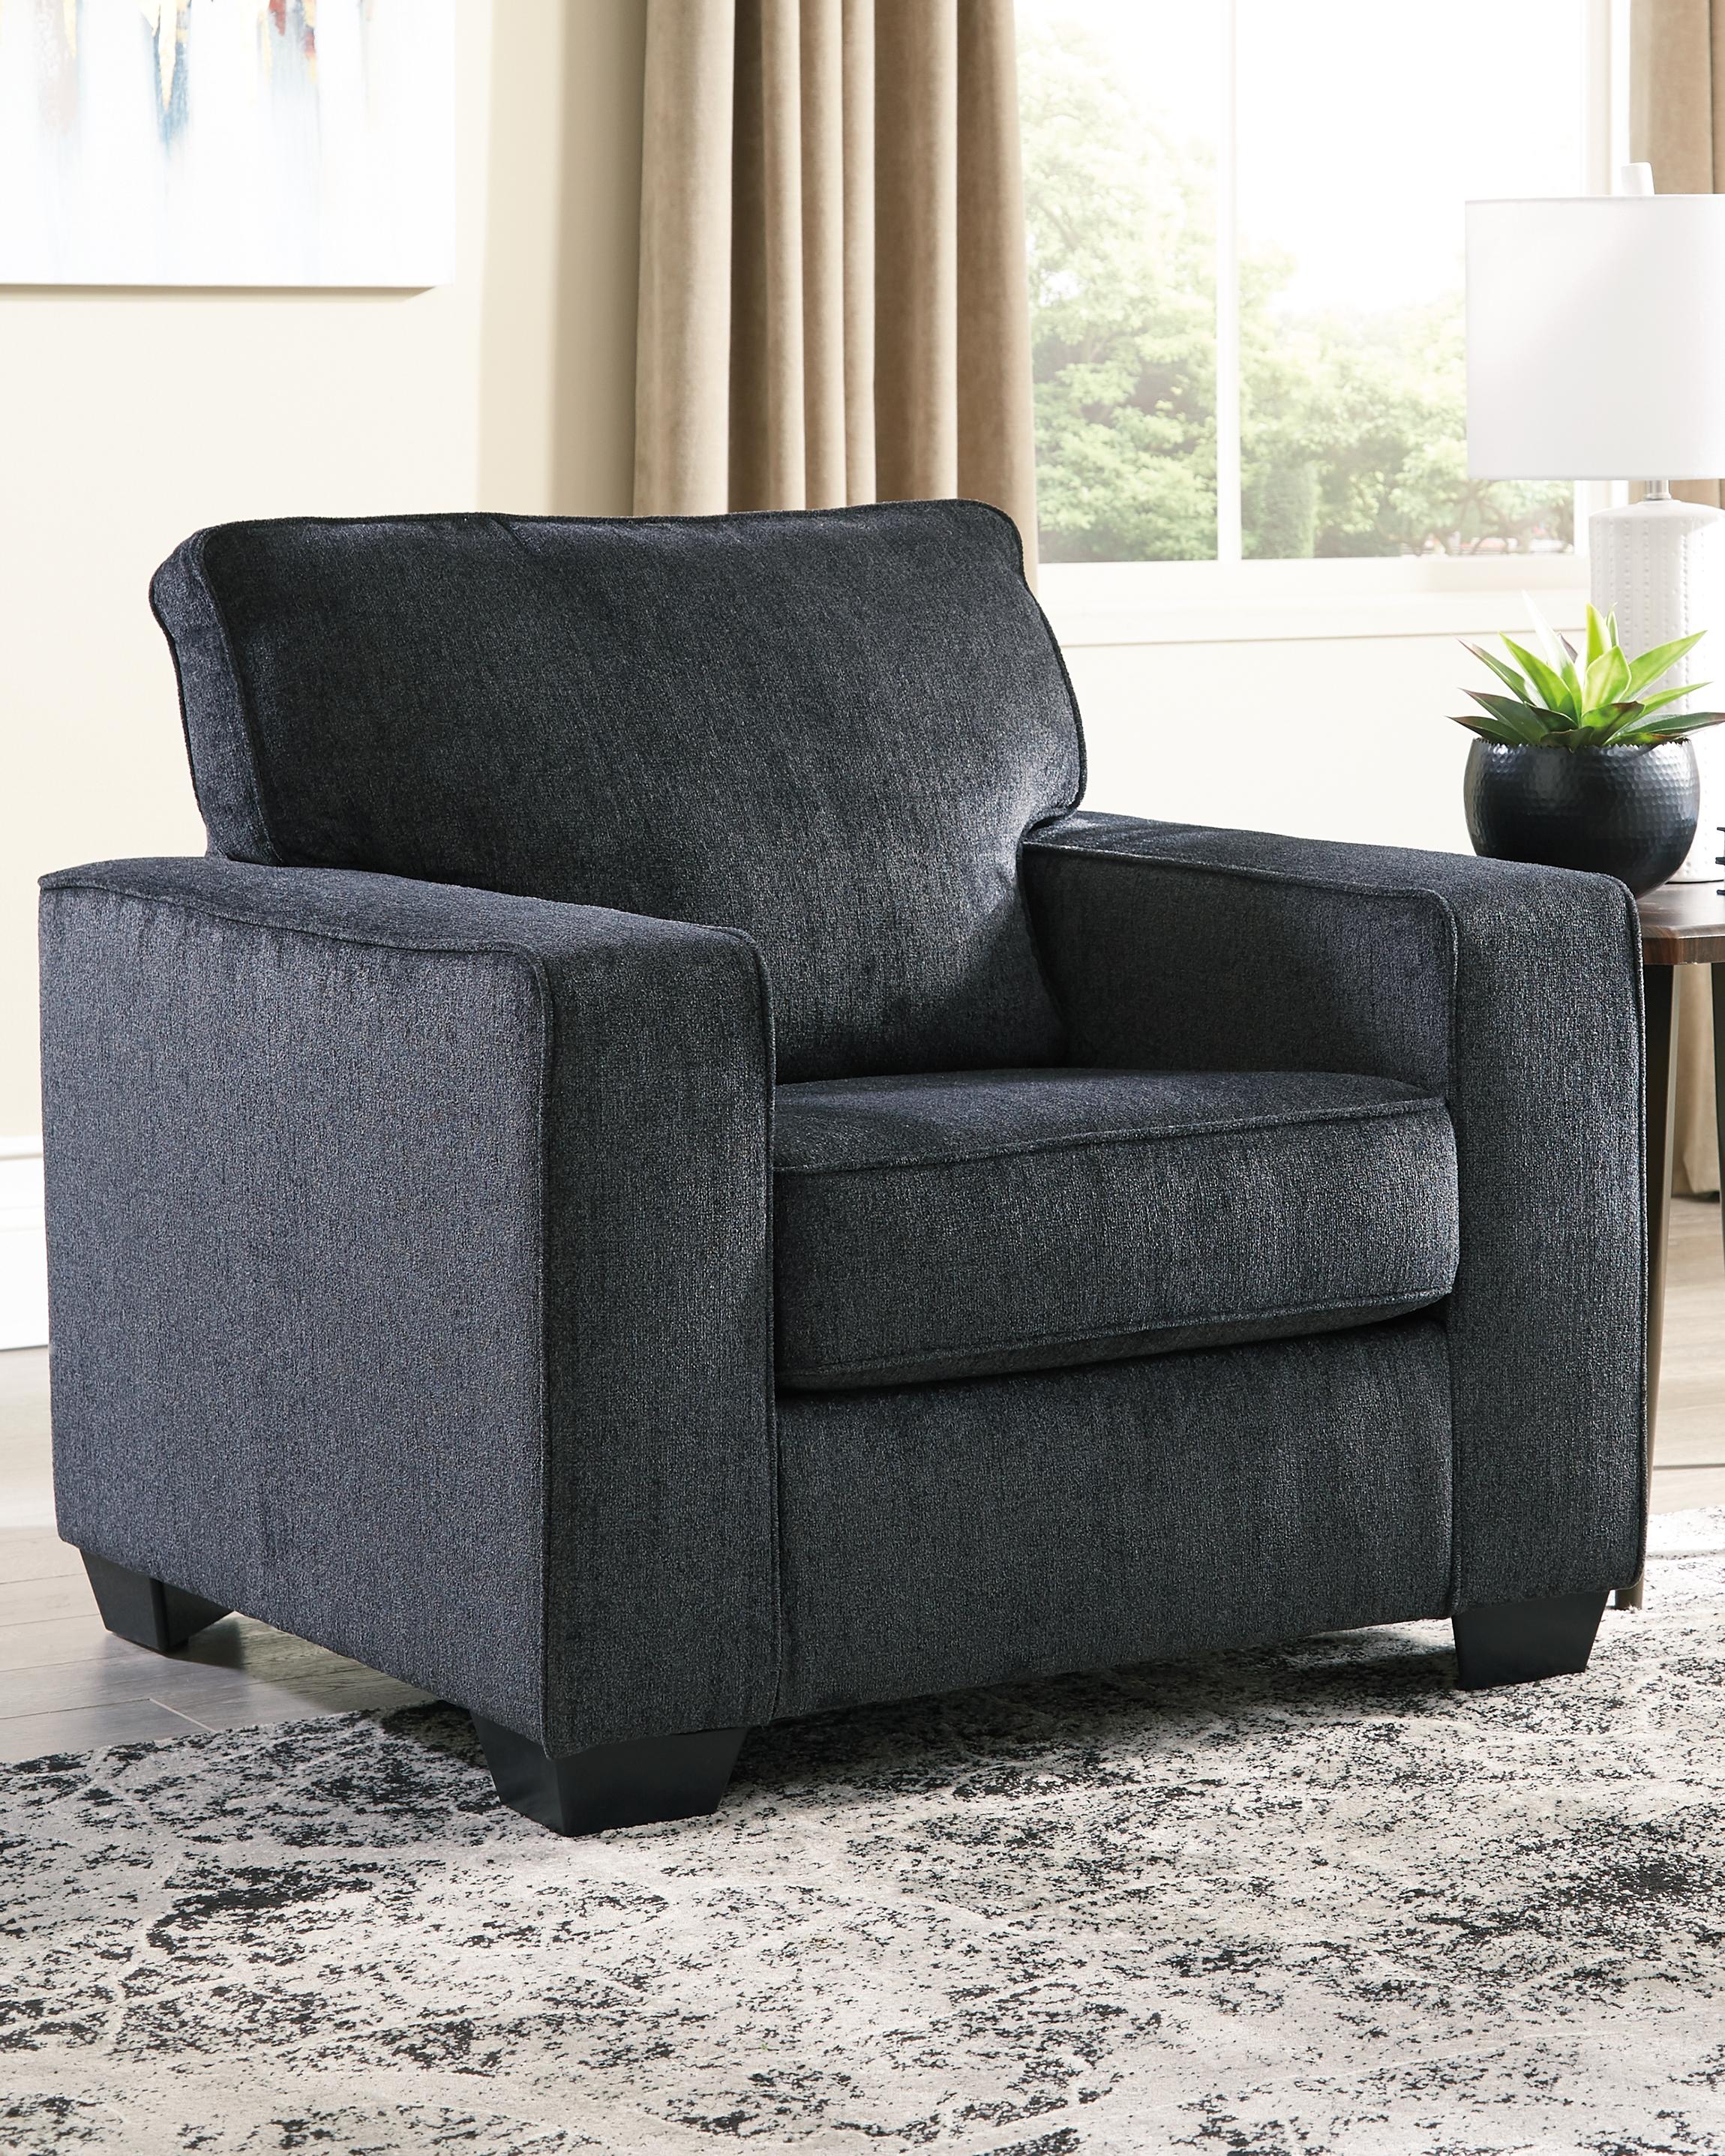 Altari Chair in Slate